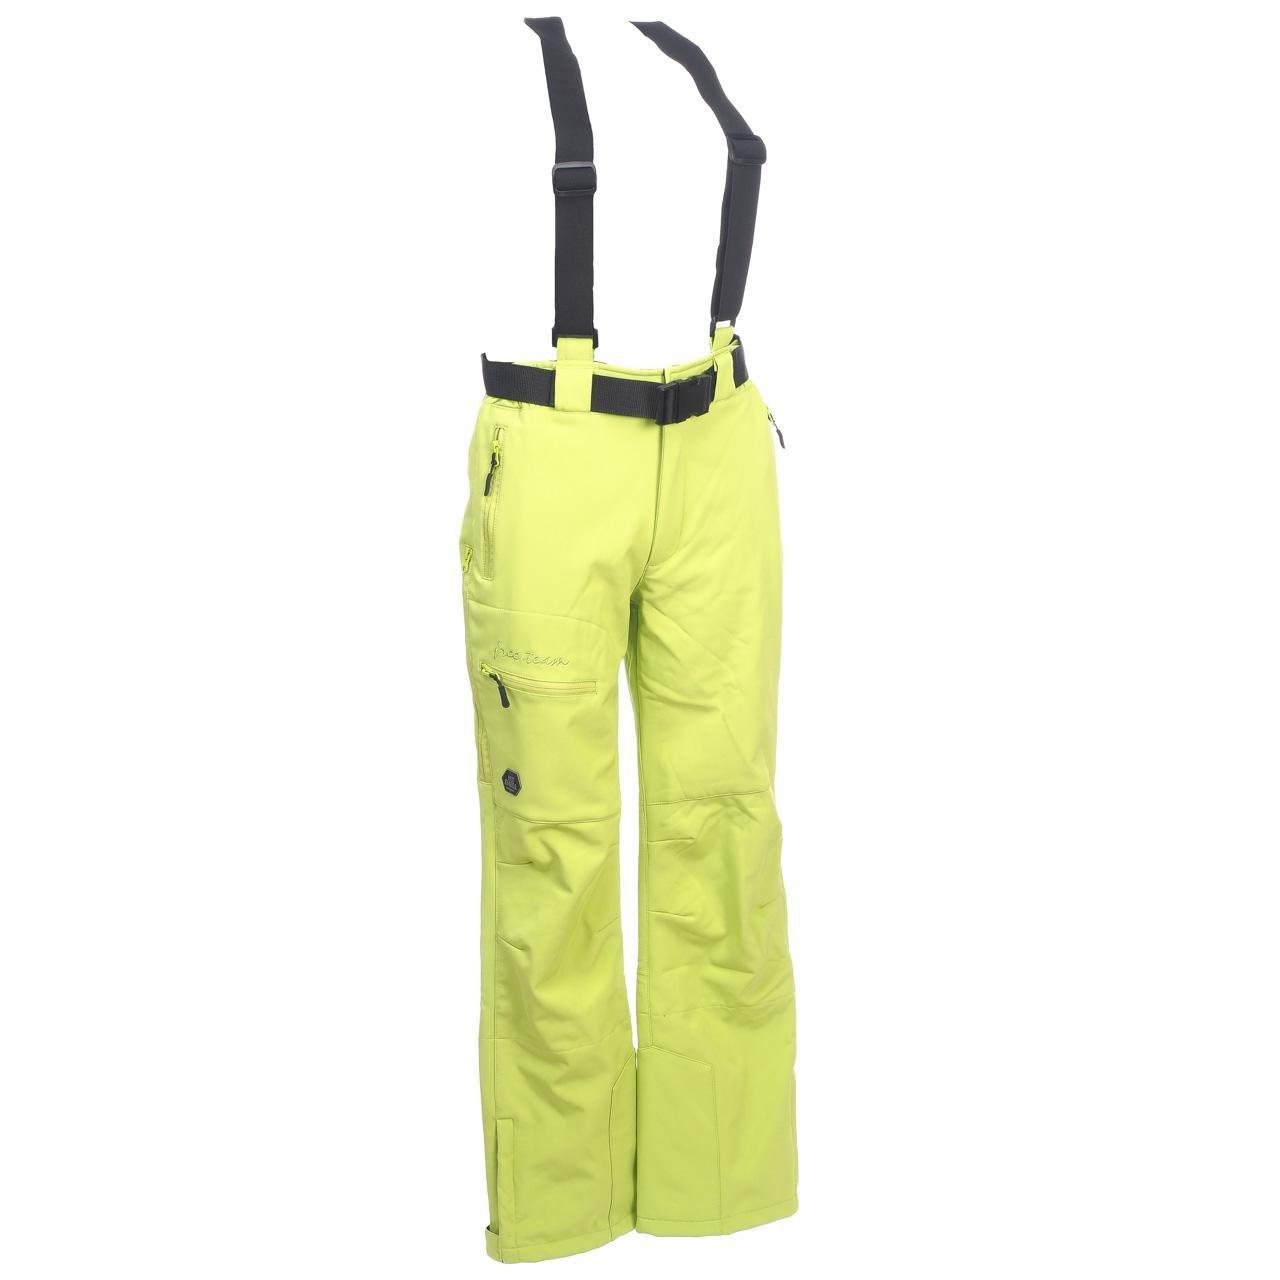 SD Best selection Softshell lemon skipant - Pantalon de ski surf